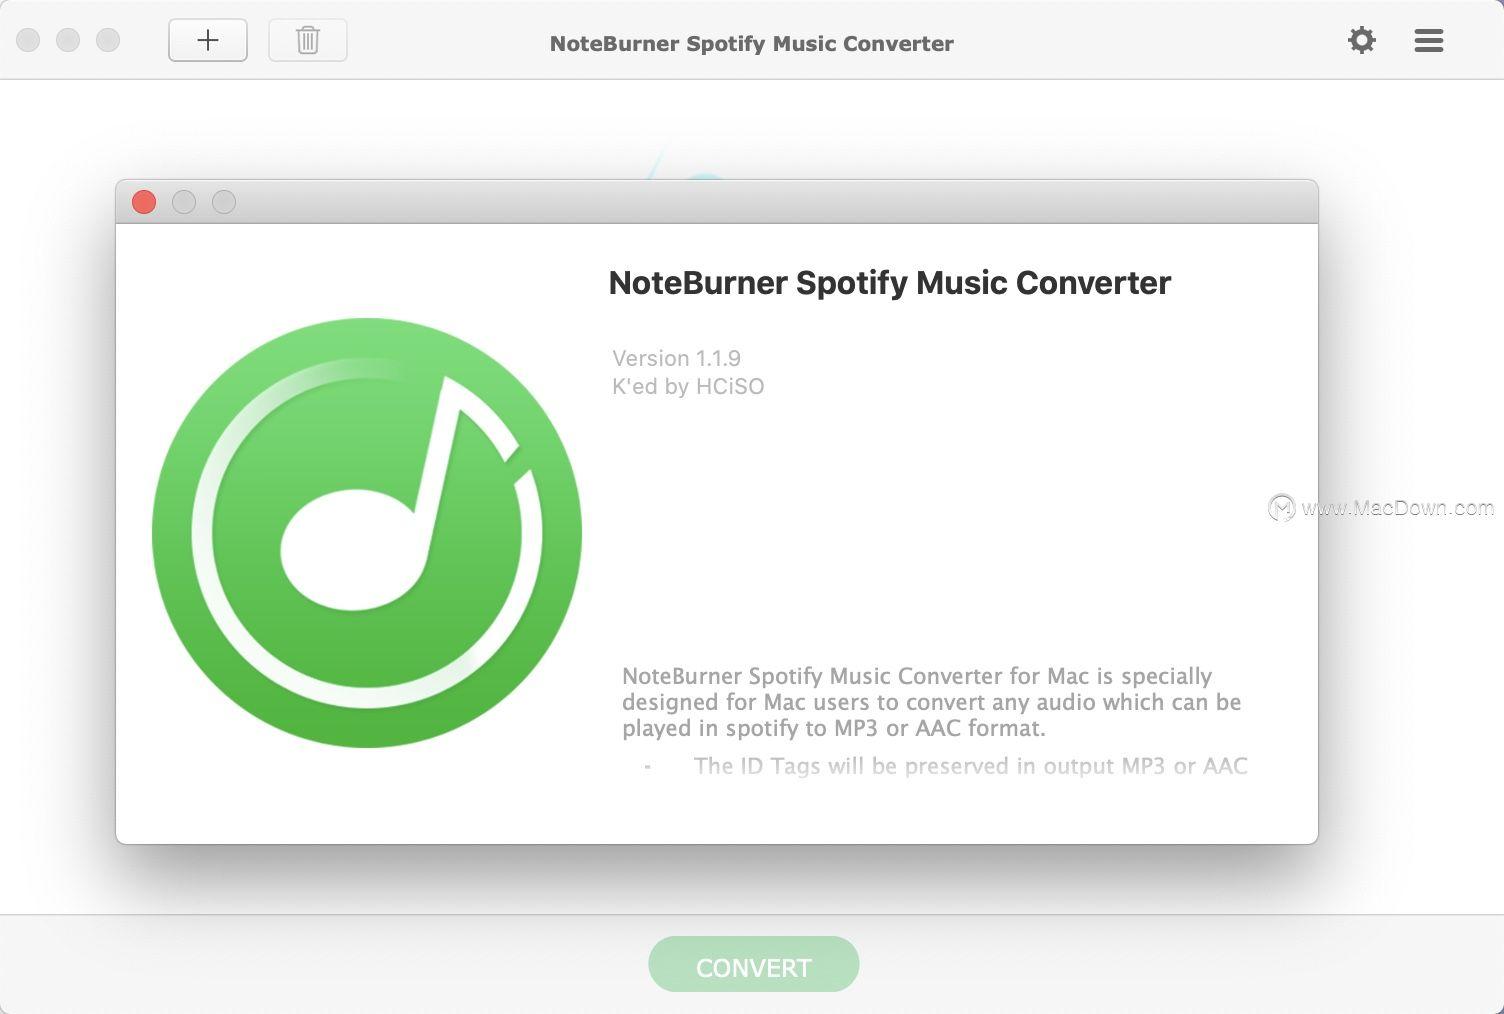 Noteburner Spotify音乐转换器Mac(音频转换器)v1.1.9